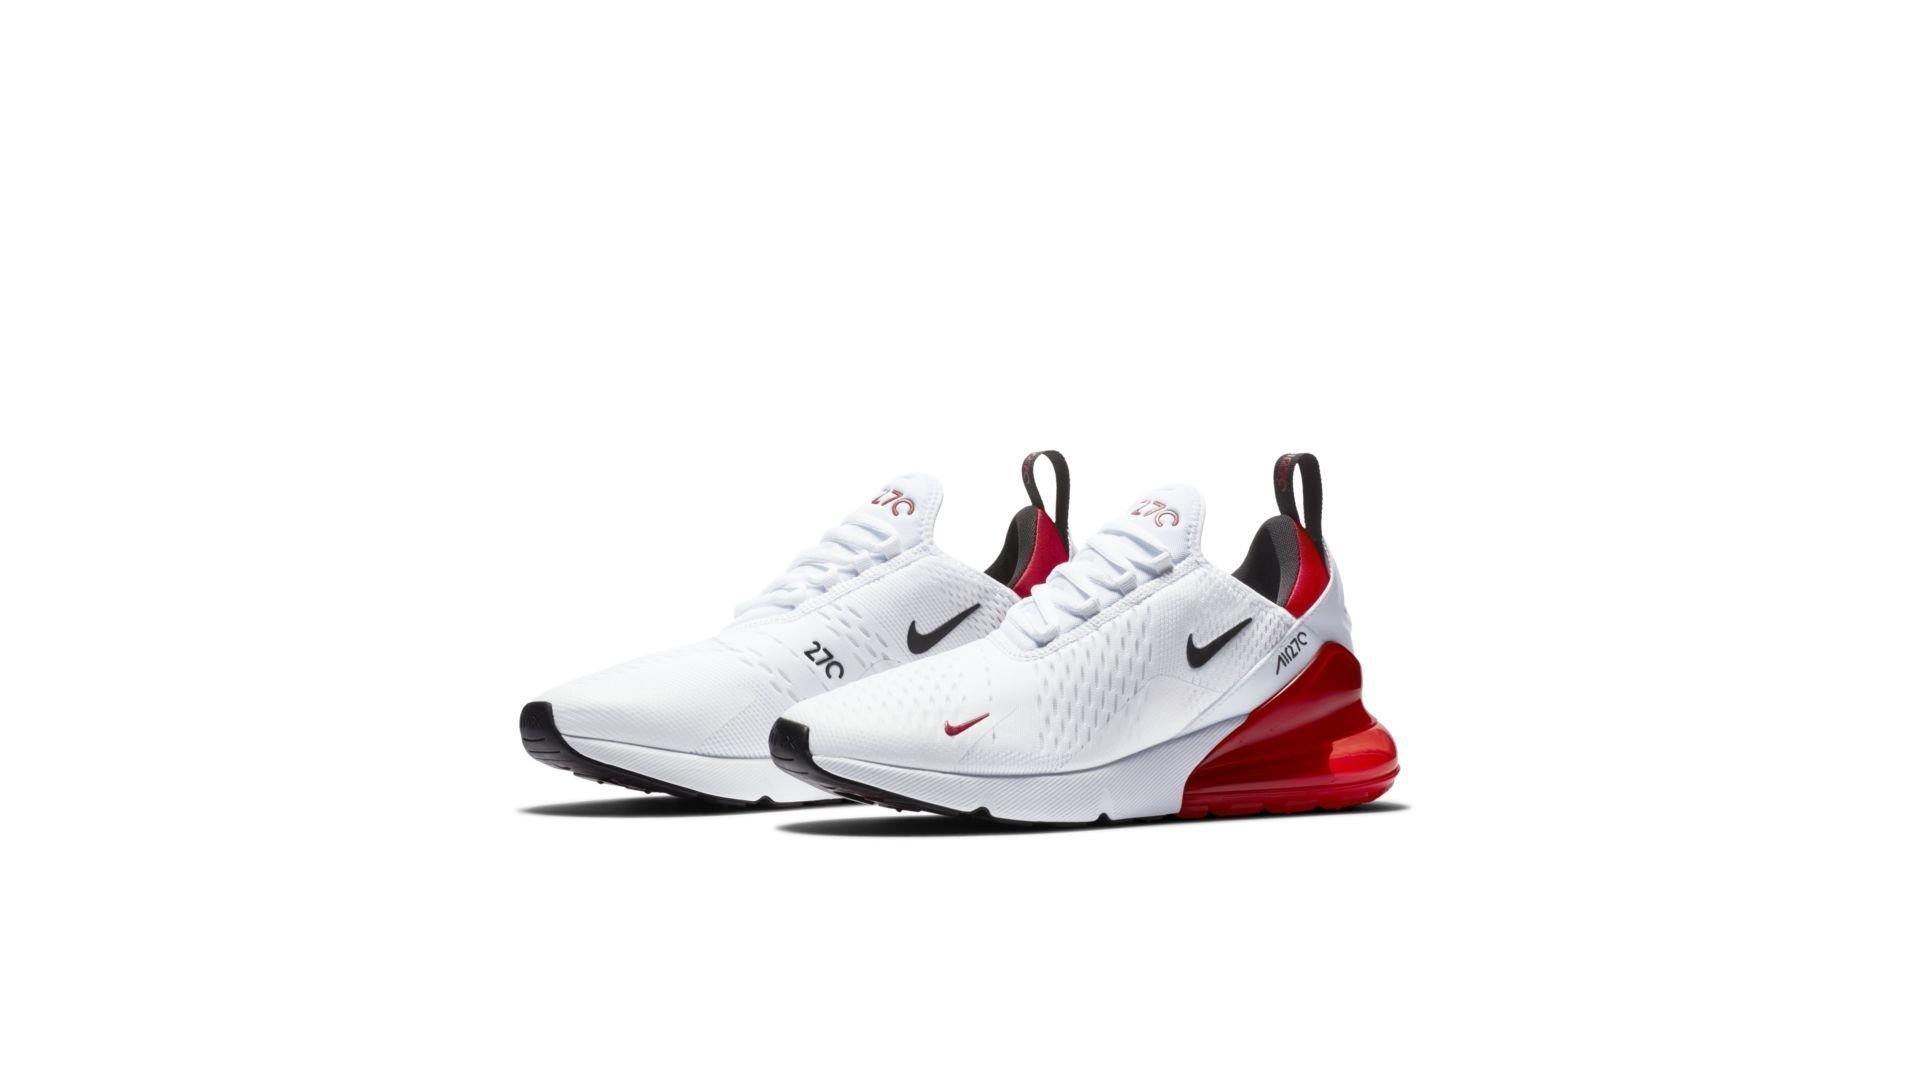 Nike Air Max 270 White Black University Red (BV2523 100)